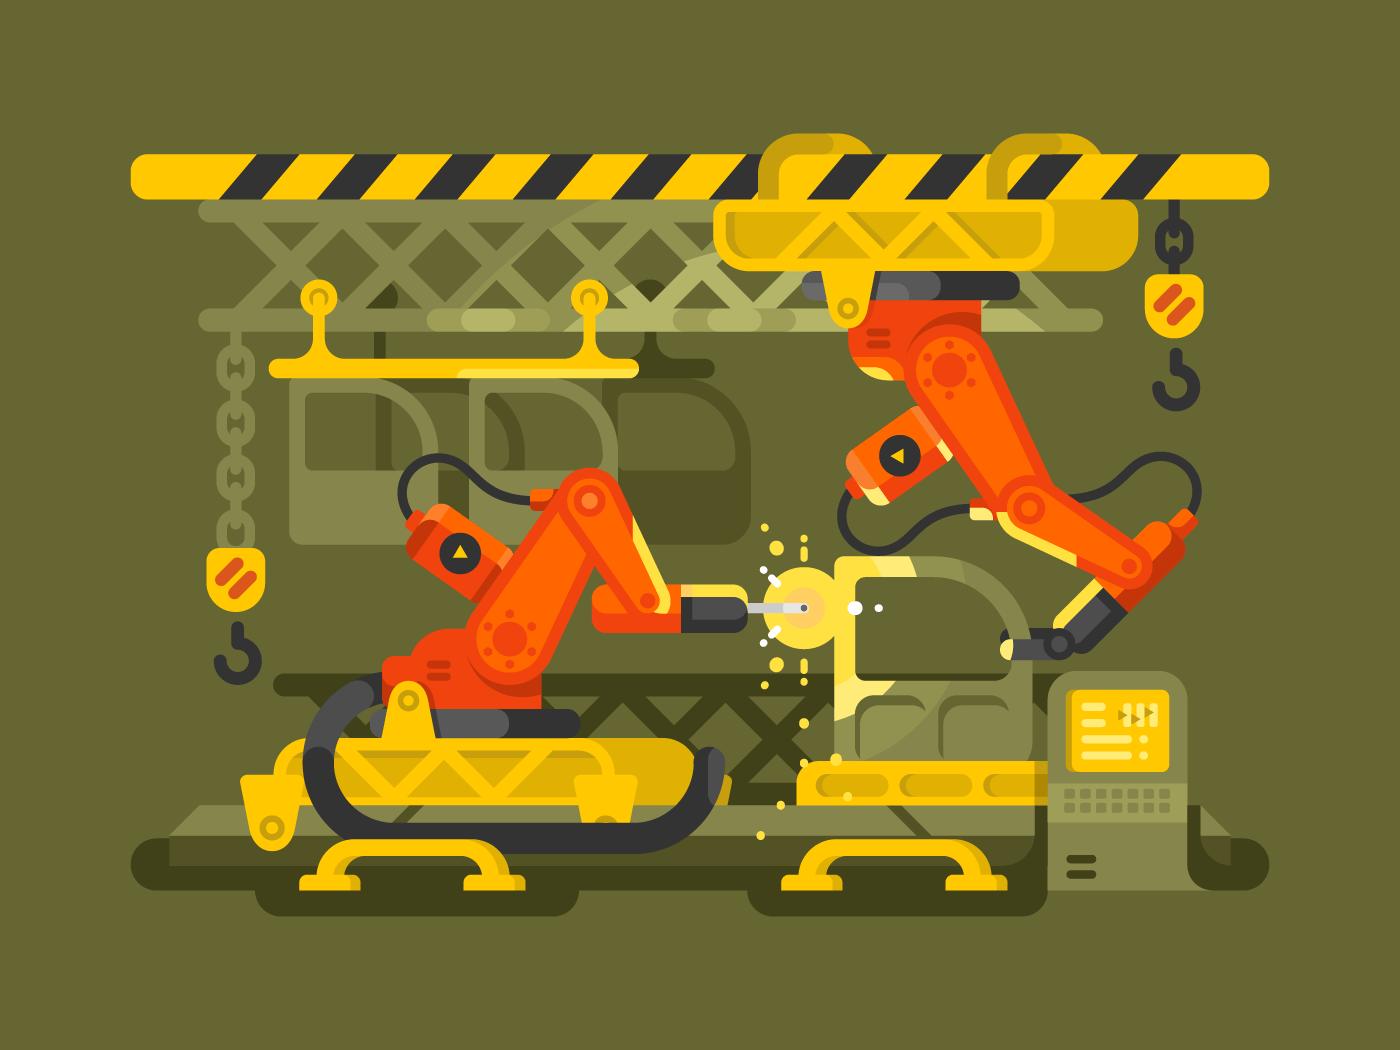 Automatic production using robotics flat vector illustration